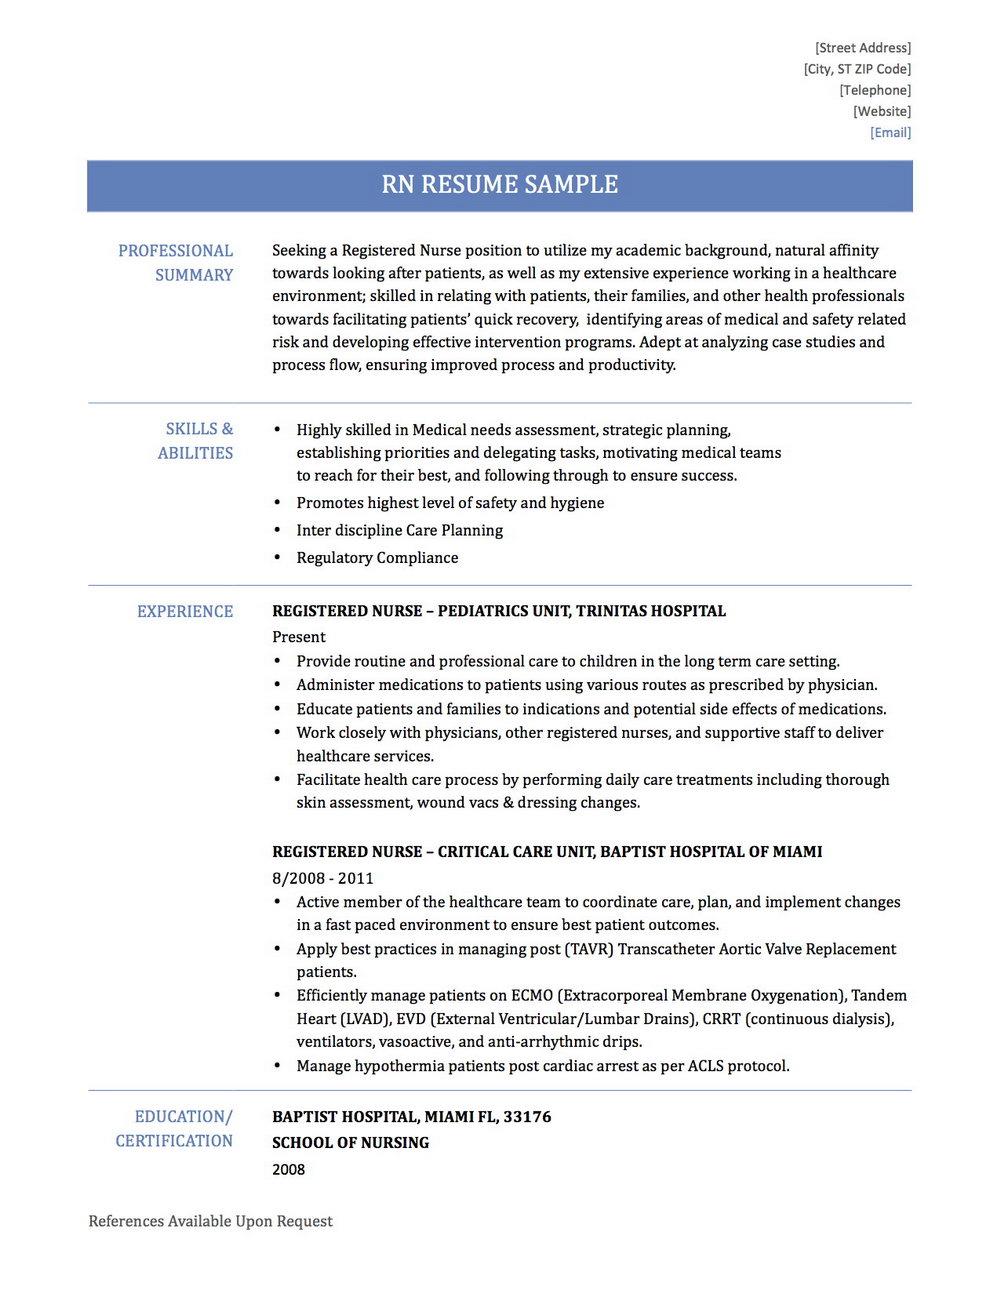 Resume For Registered Nurse